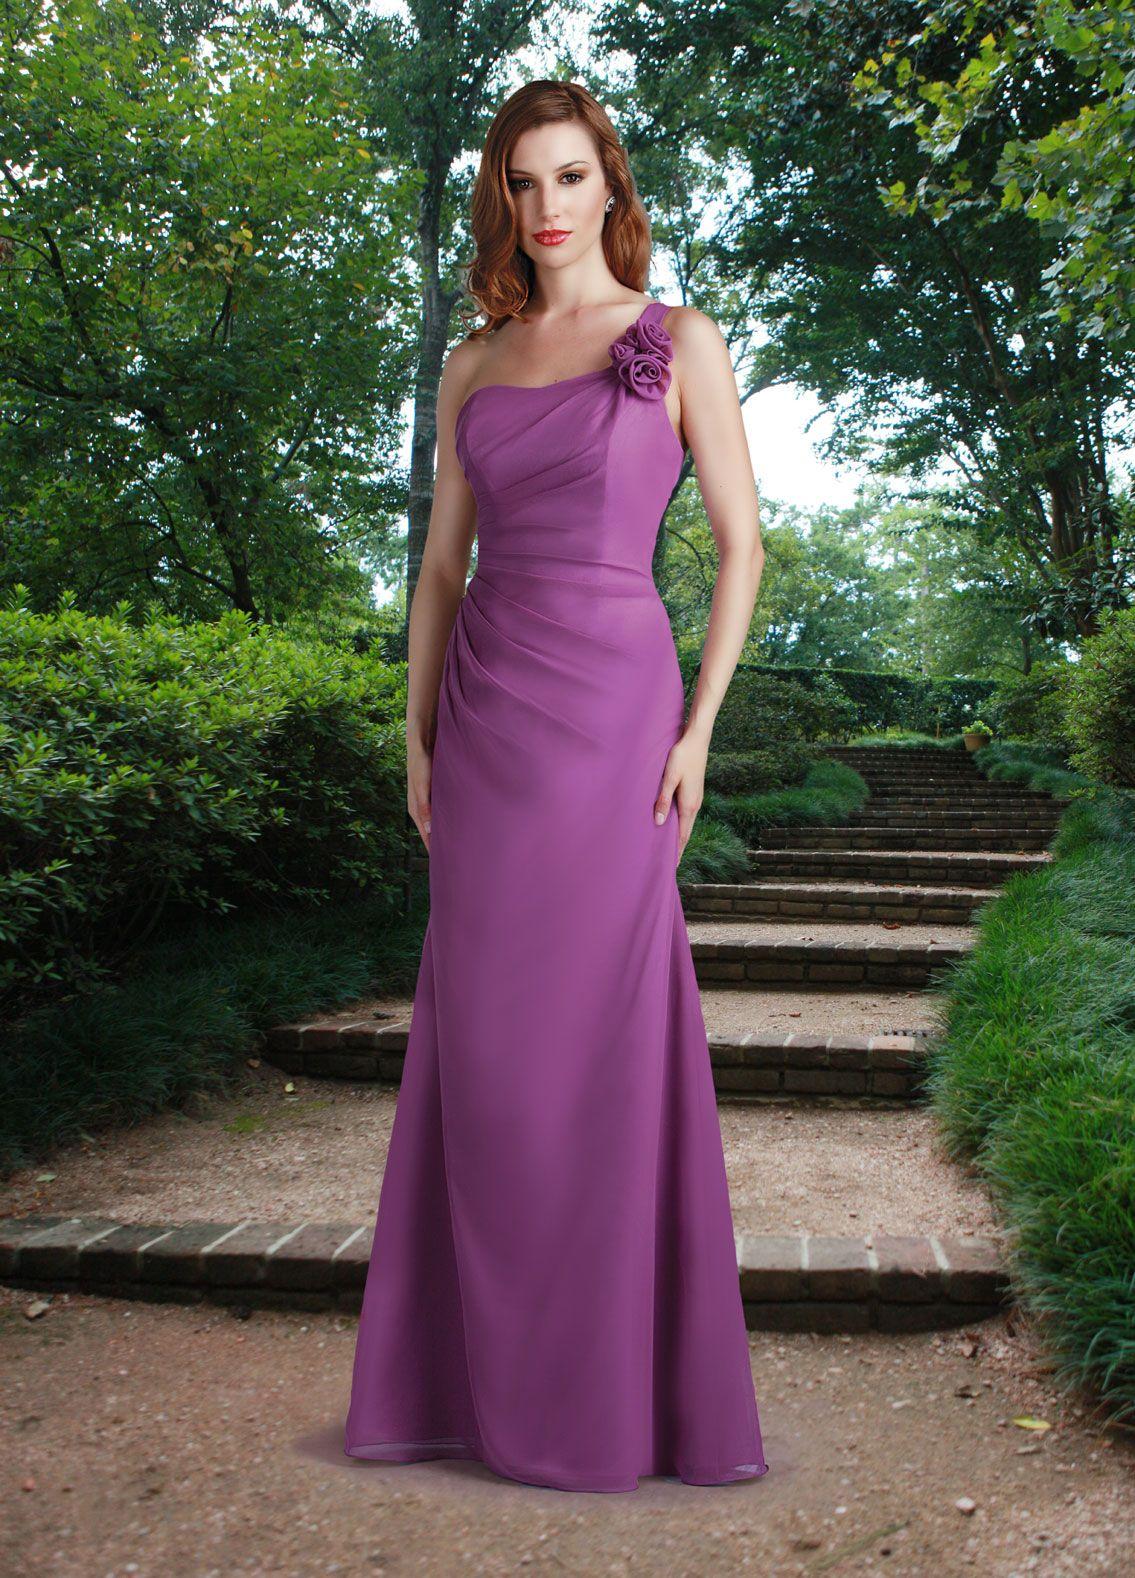 Bridesmaid Dresses Style #60014   wedding dress styles   Pinterest ...